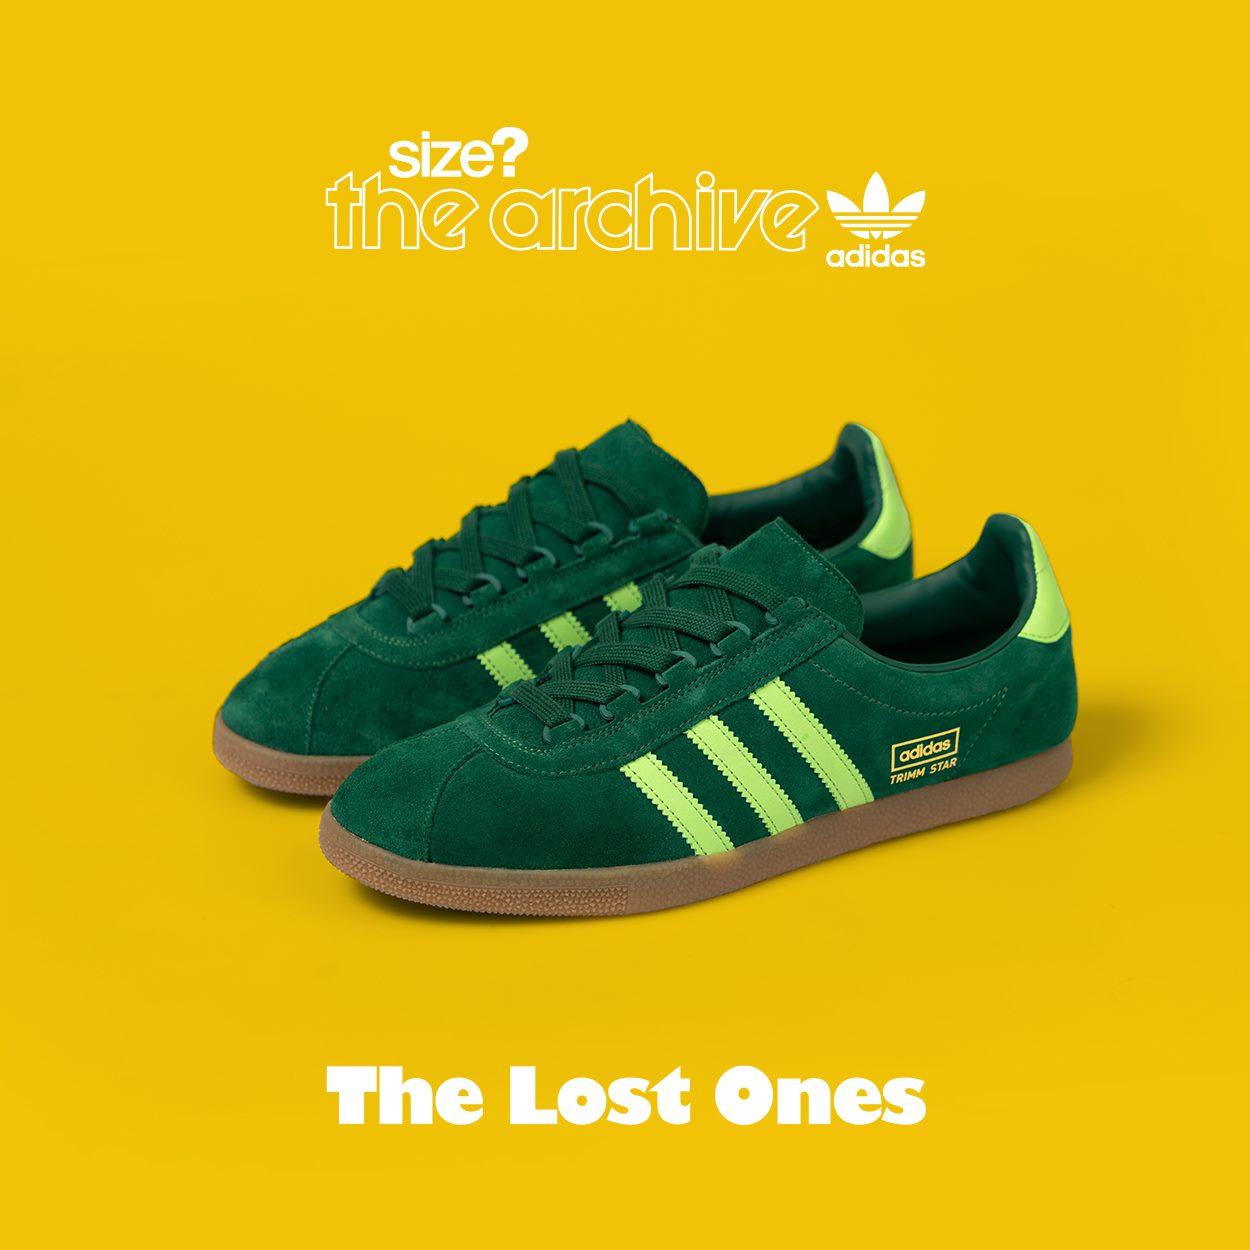 Our adidas Originals 'The Lost Ones